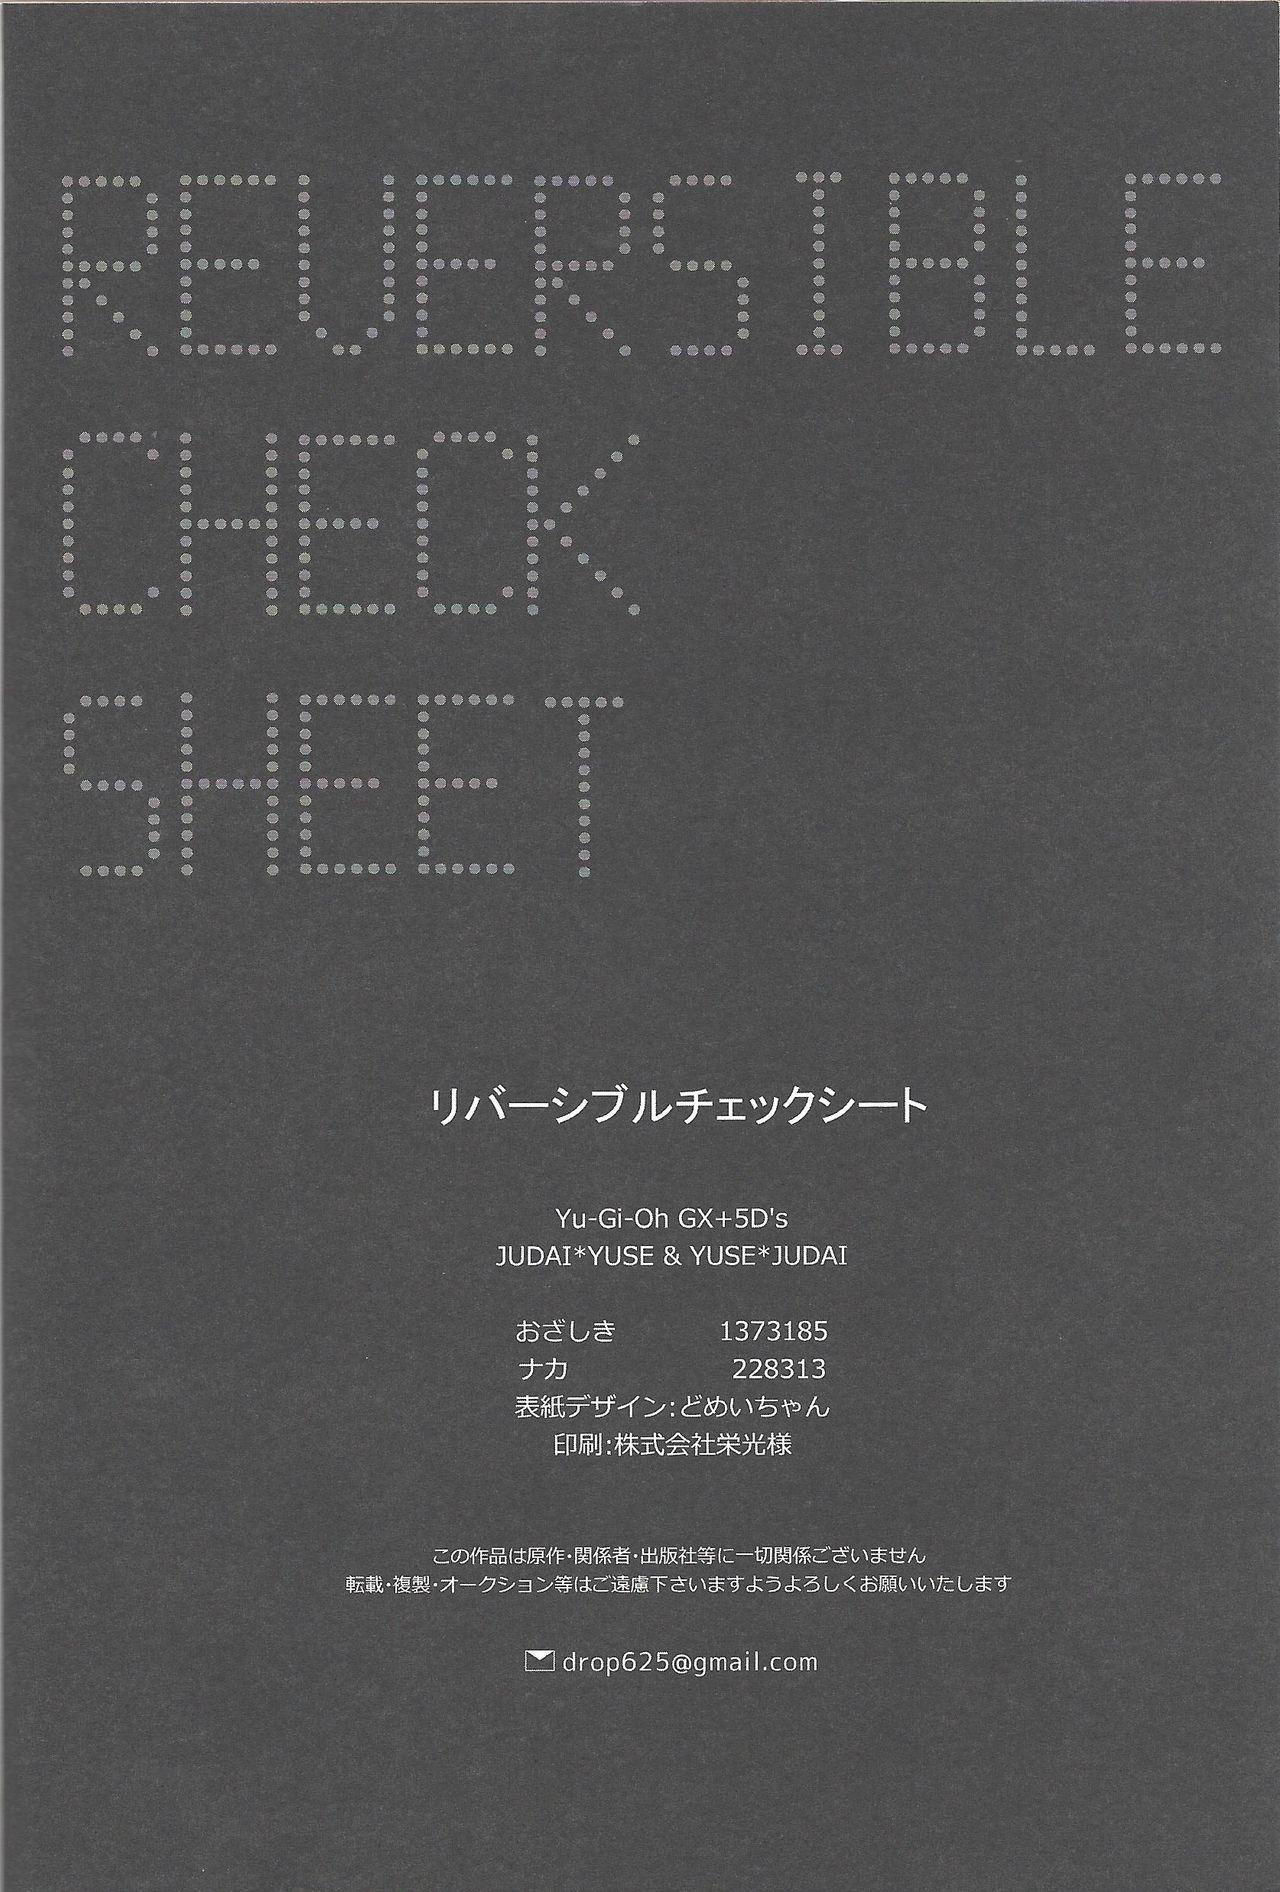 Reversible Check Sheet 28